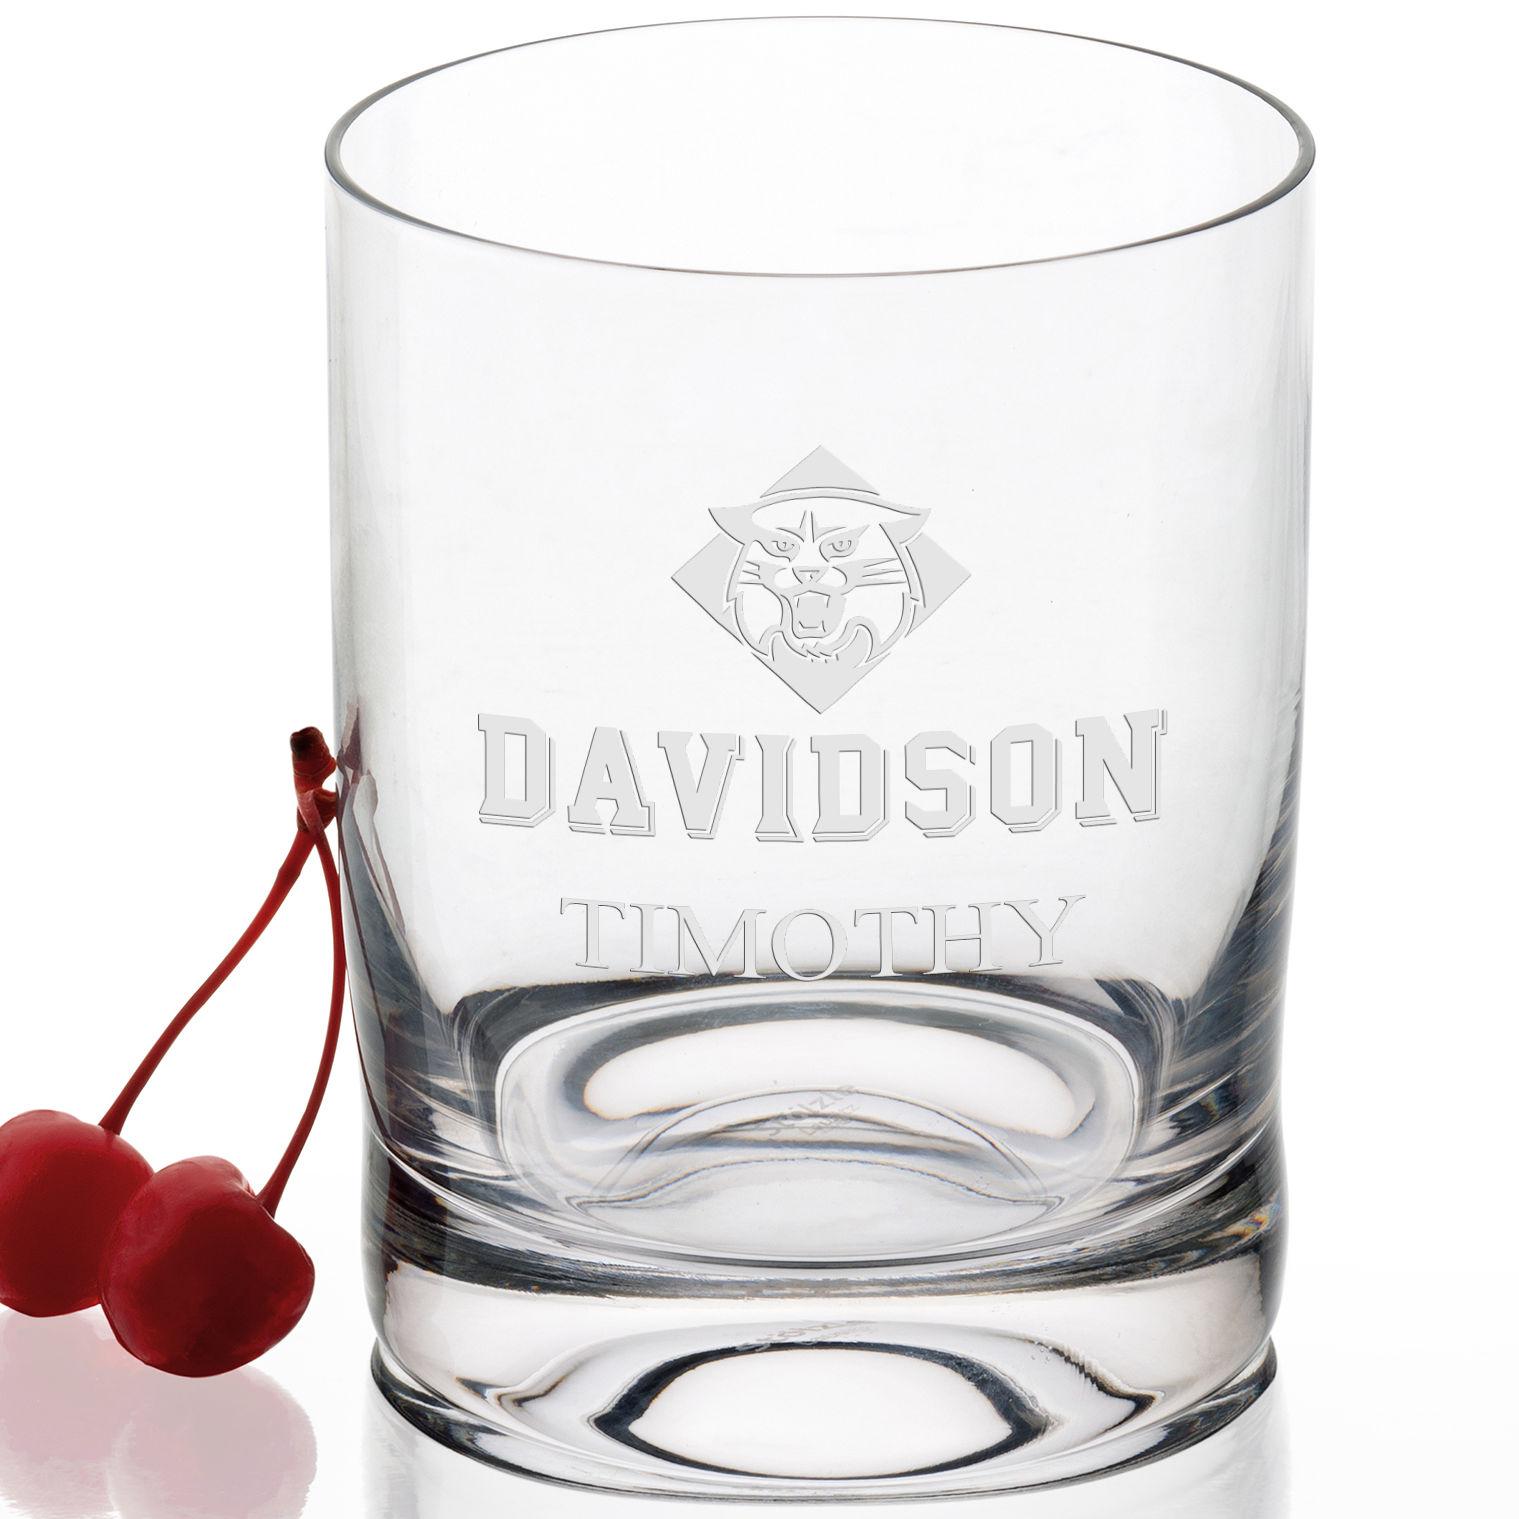 Davidson College Tumbler Glasses - Set of 2 - Image 2